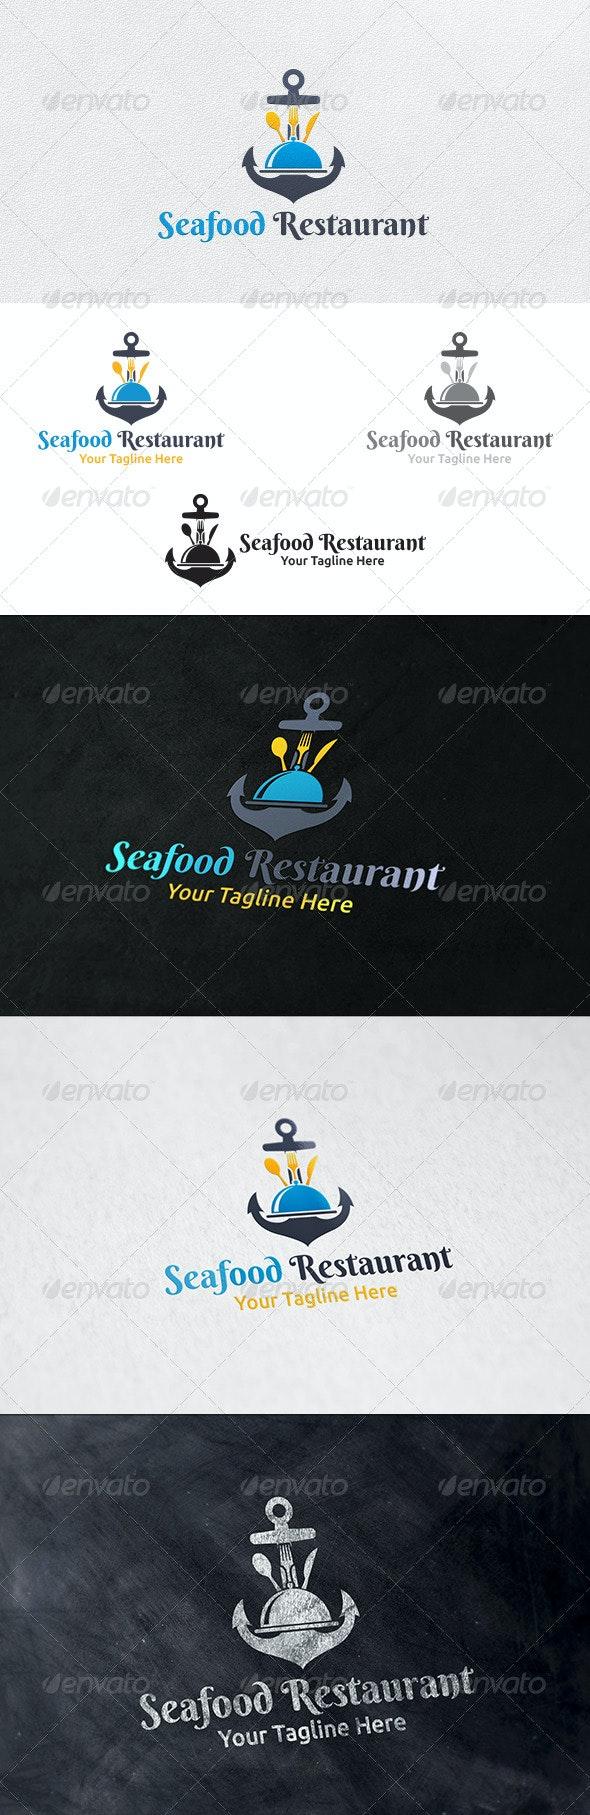 Seafood Restaurant - Logo Template  - Restaurant Logo Templates